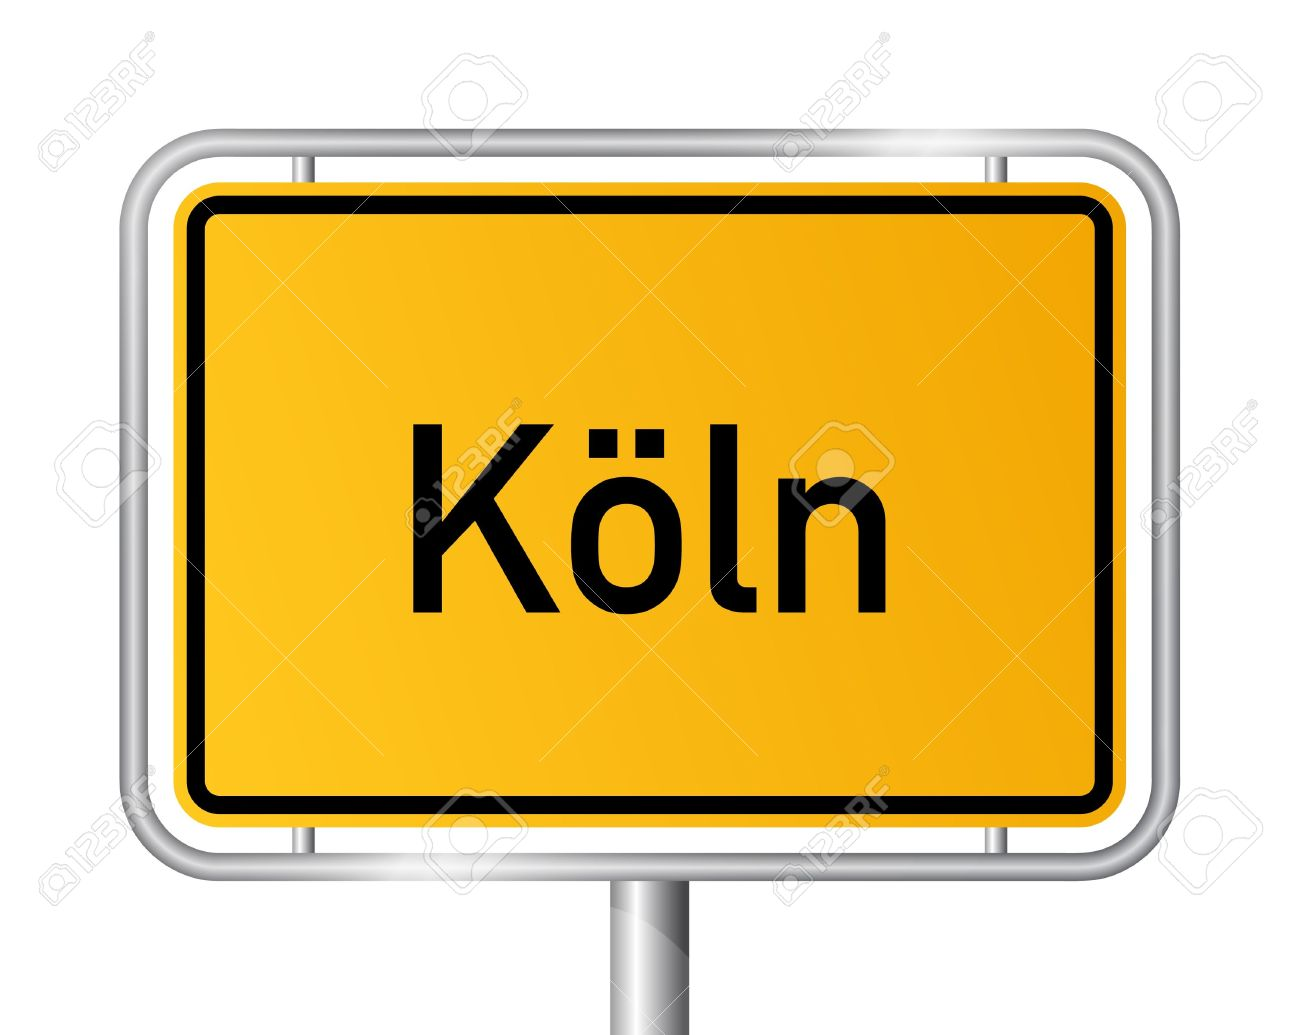 City Limit Sign COLOGNE / K LN Against White Background.